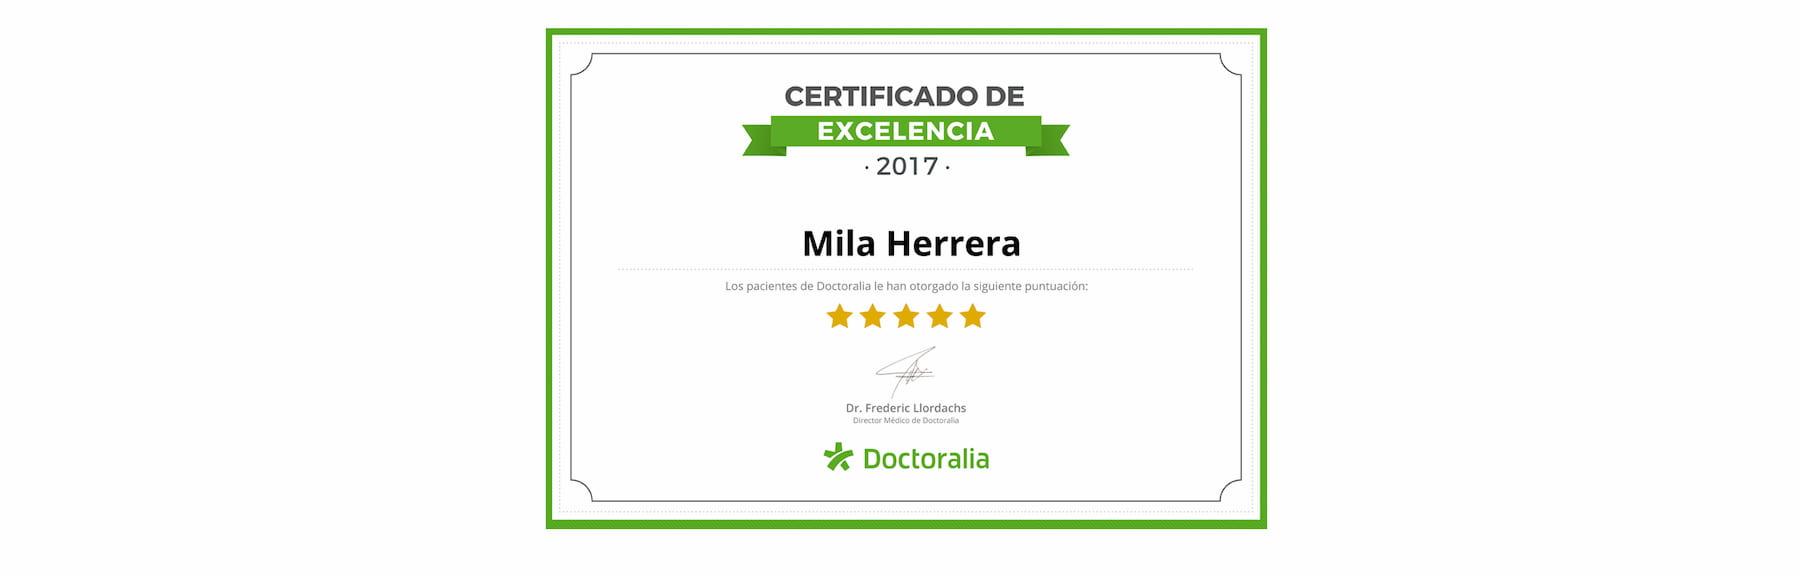 slide-certificado-excelenciajpg